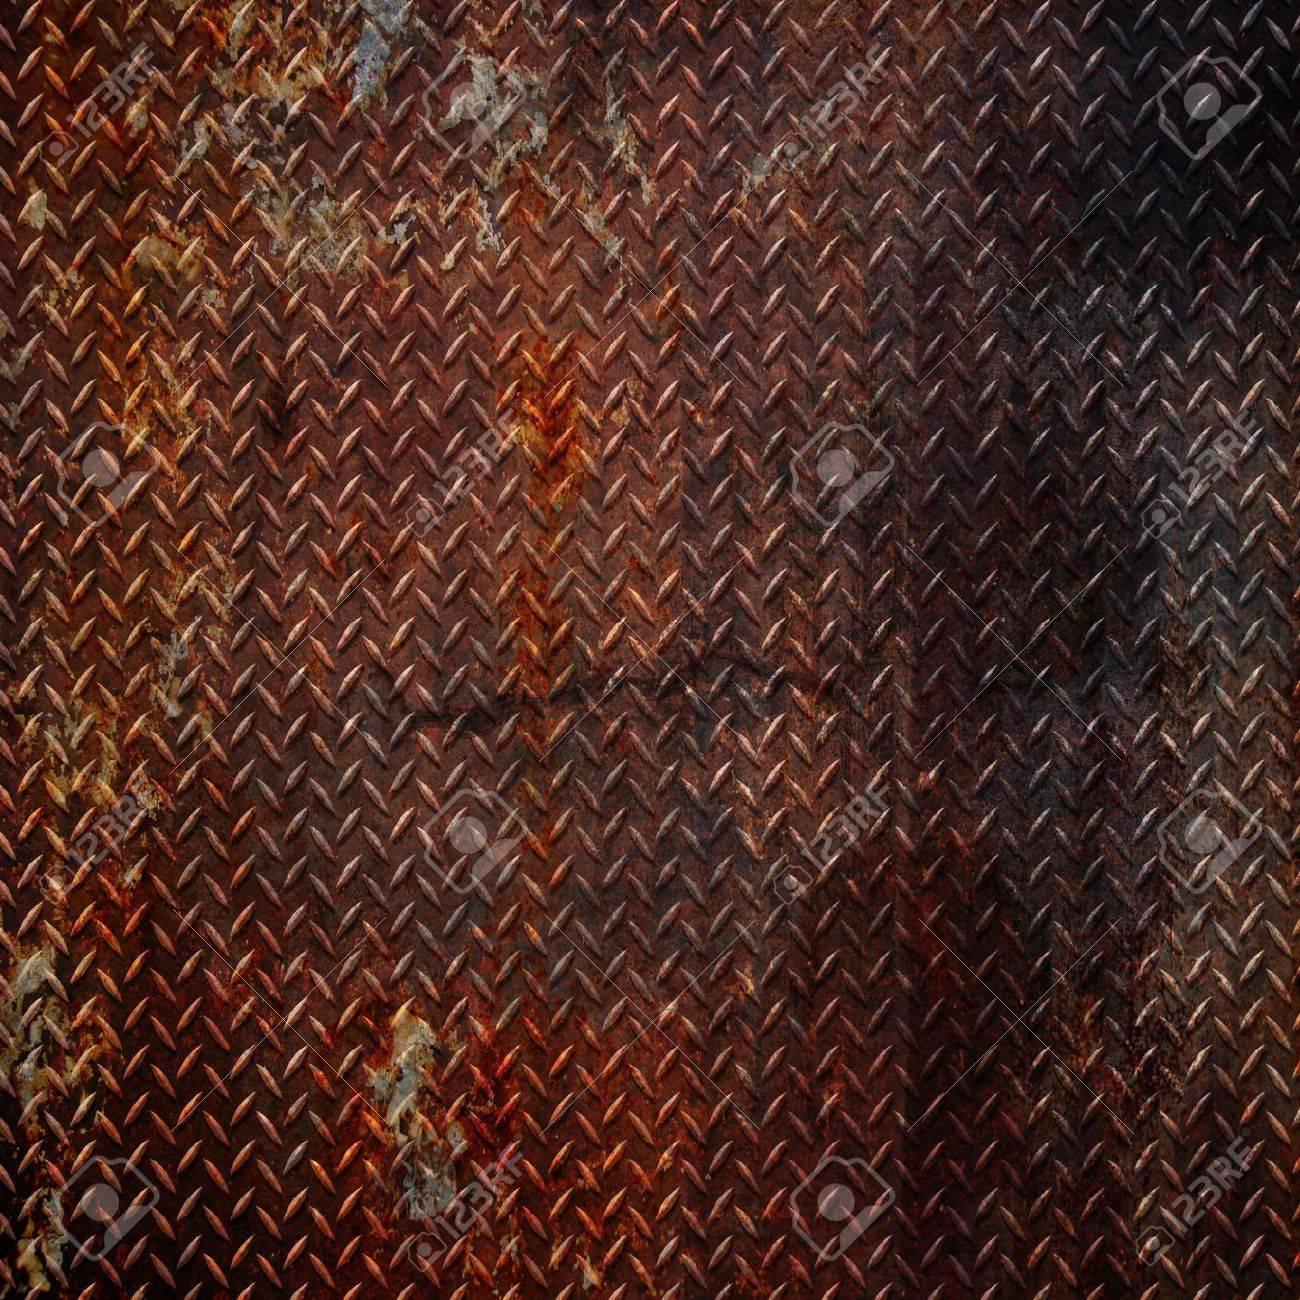 grunge diamond metal background Stock Photo - 7419579